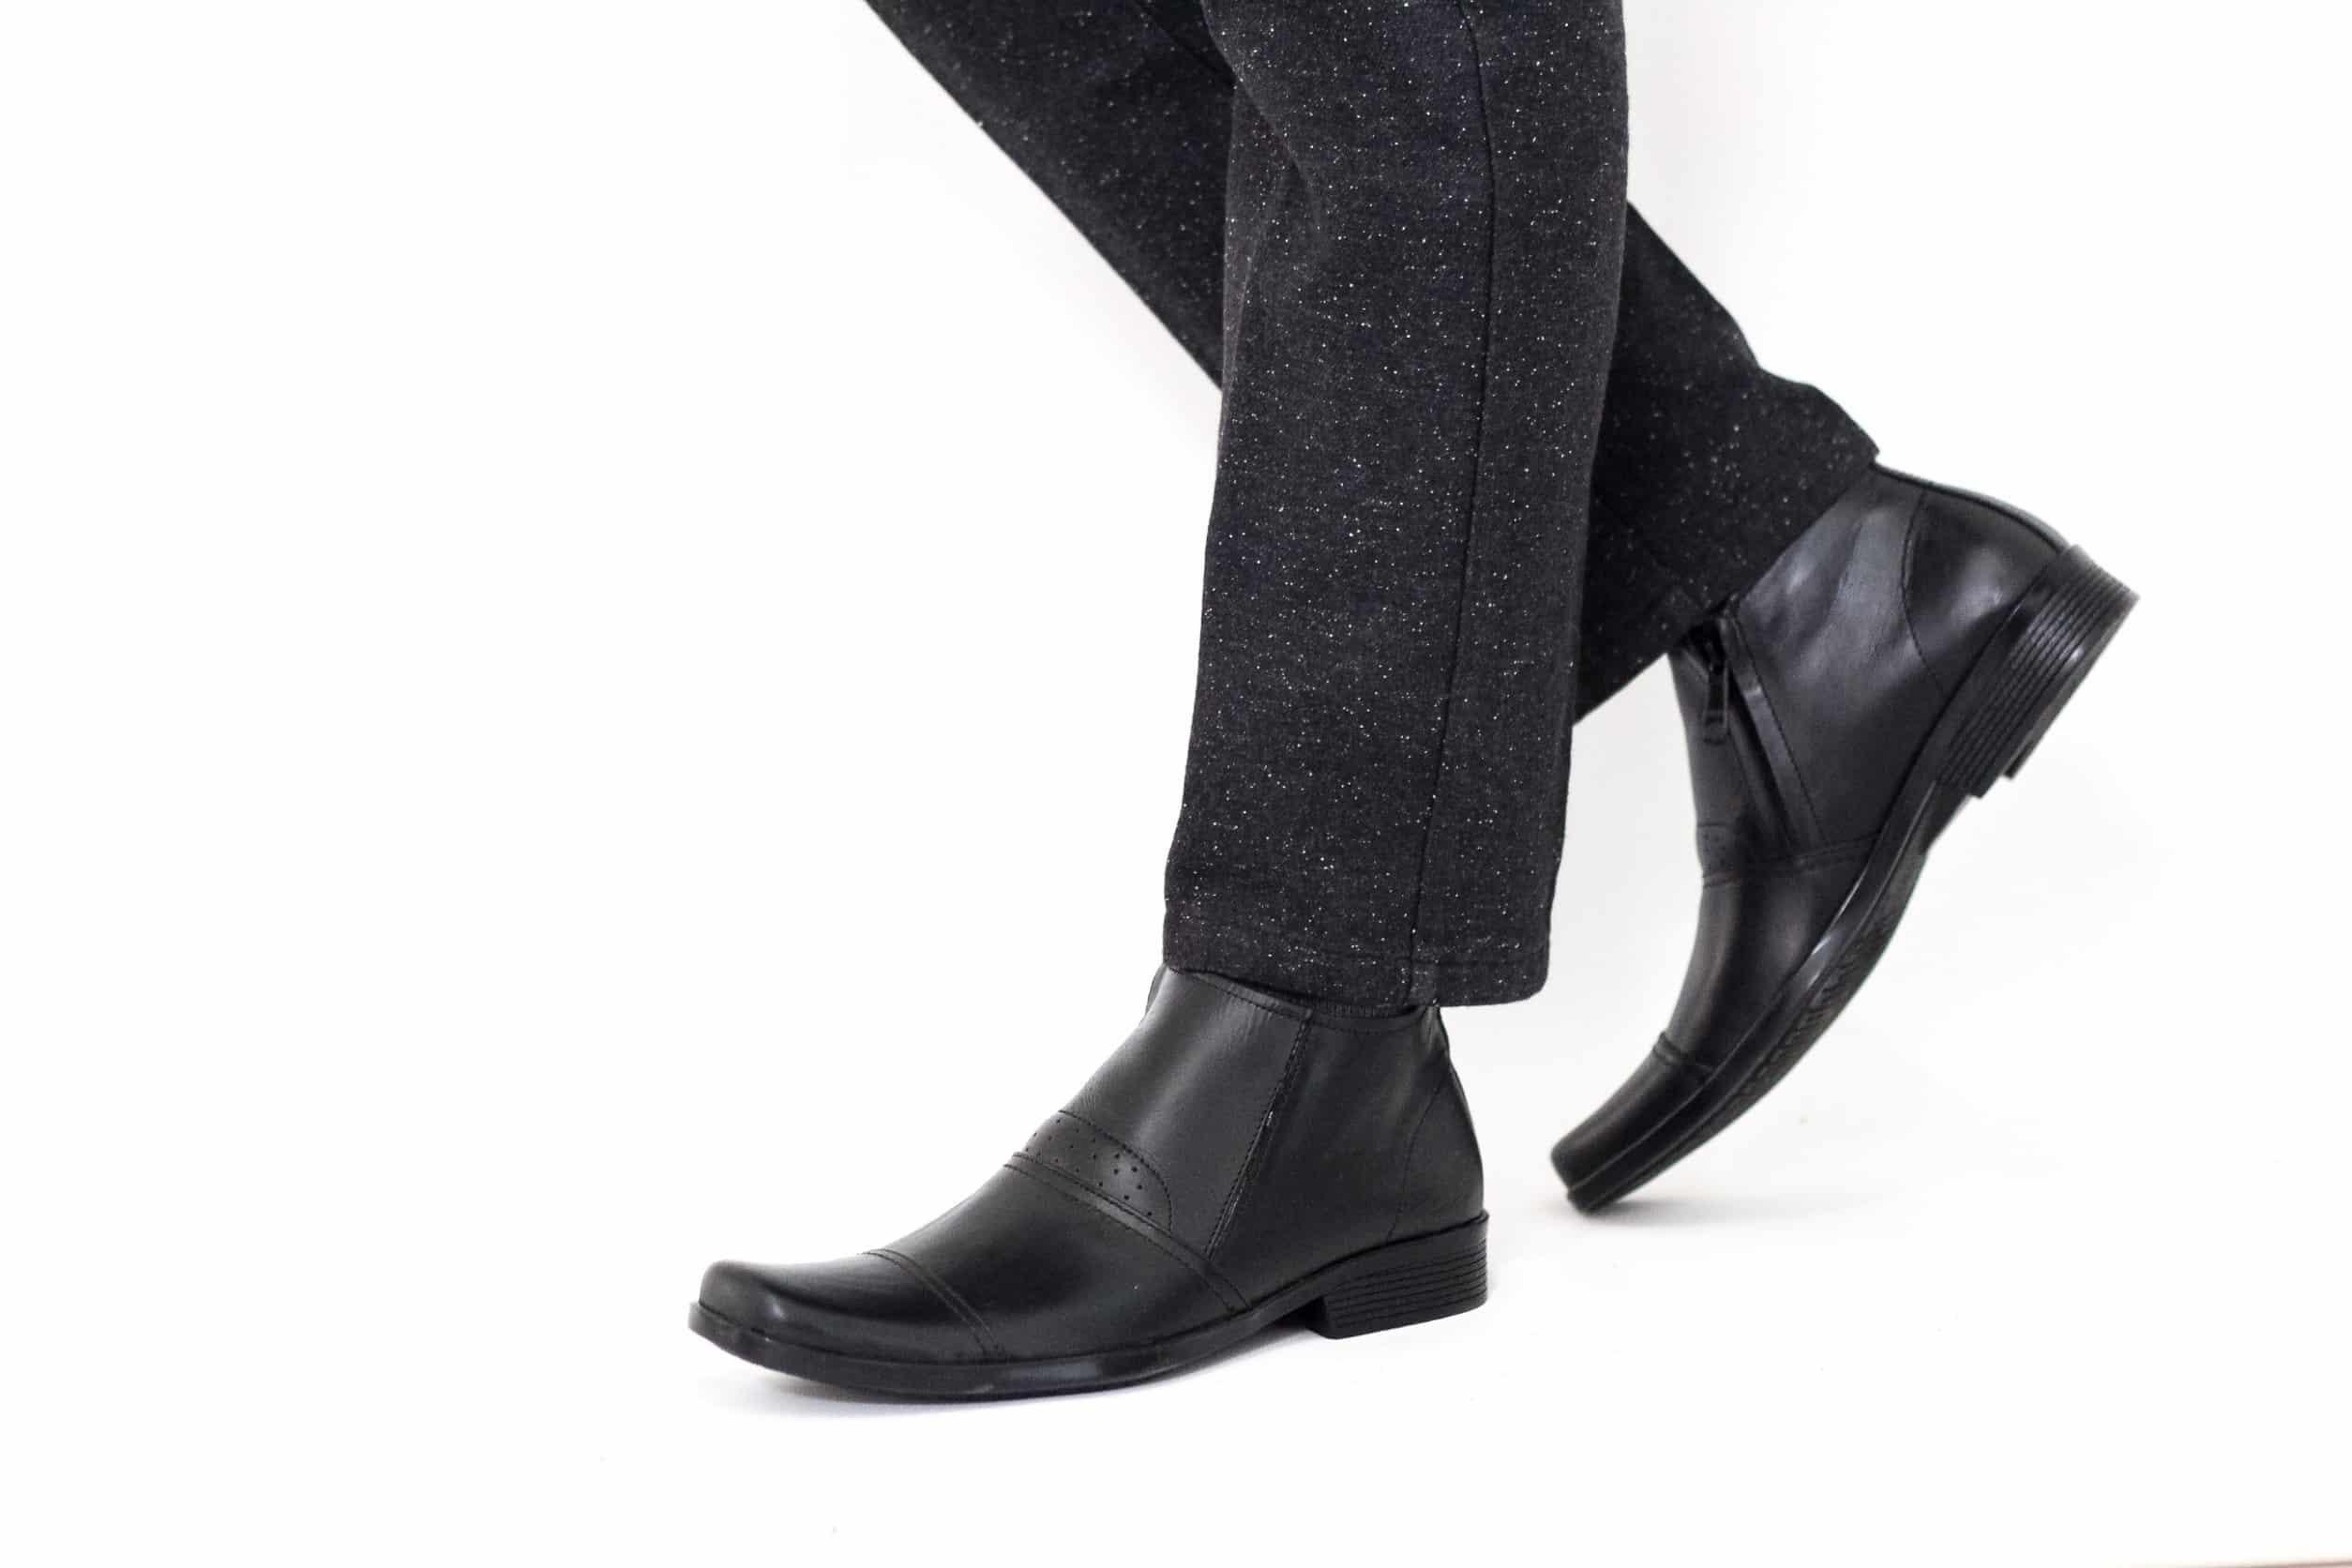 Sepatu-Fantofel-Cevany-Boots-Shoes